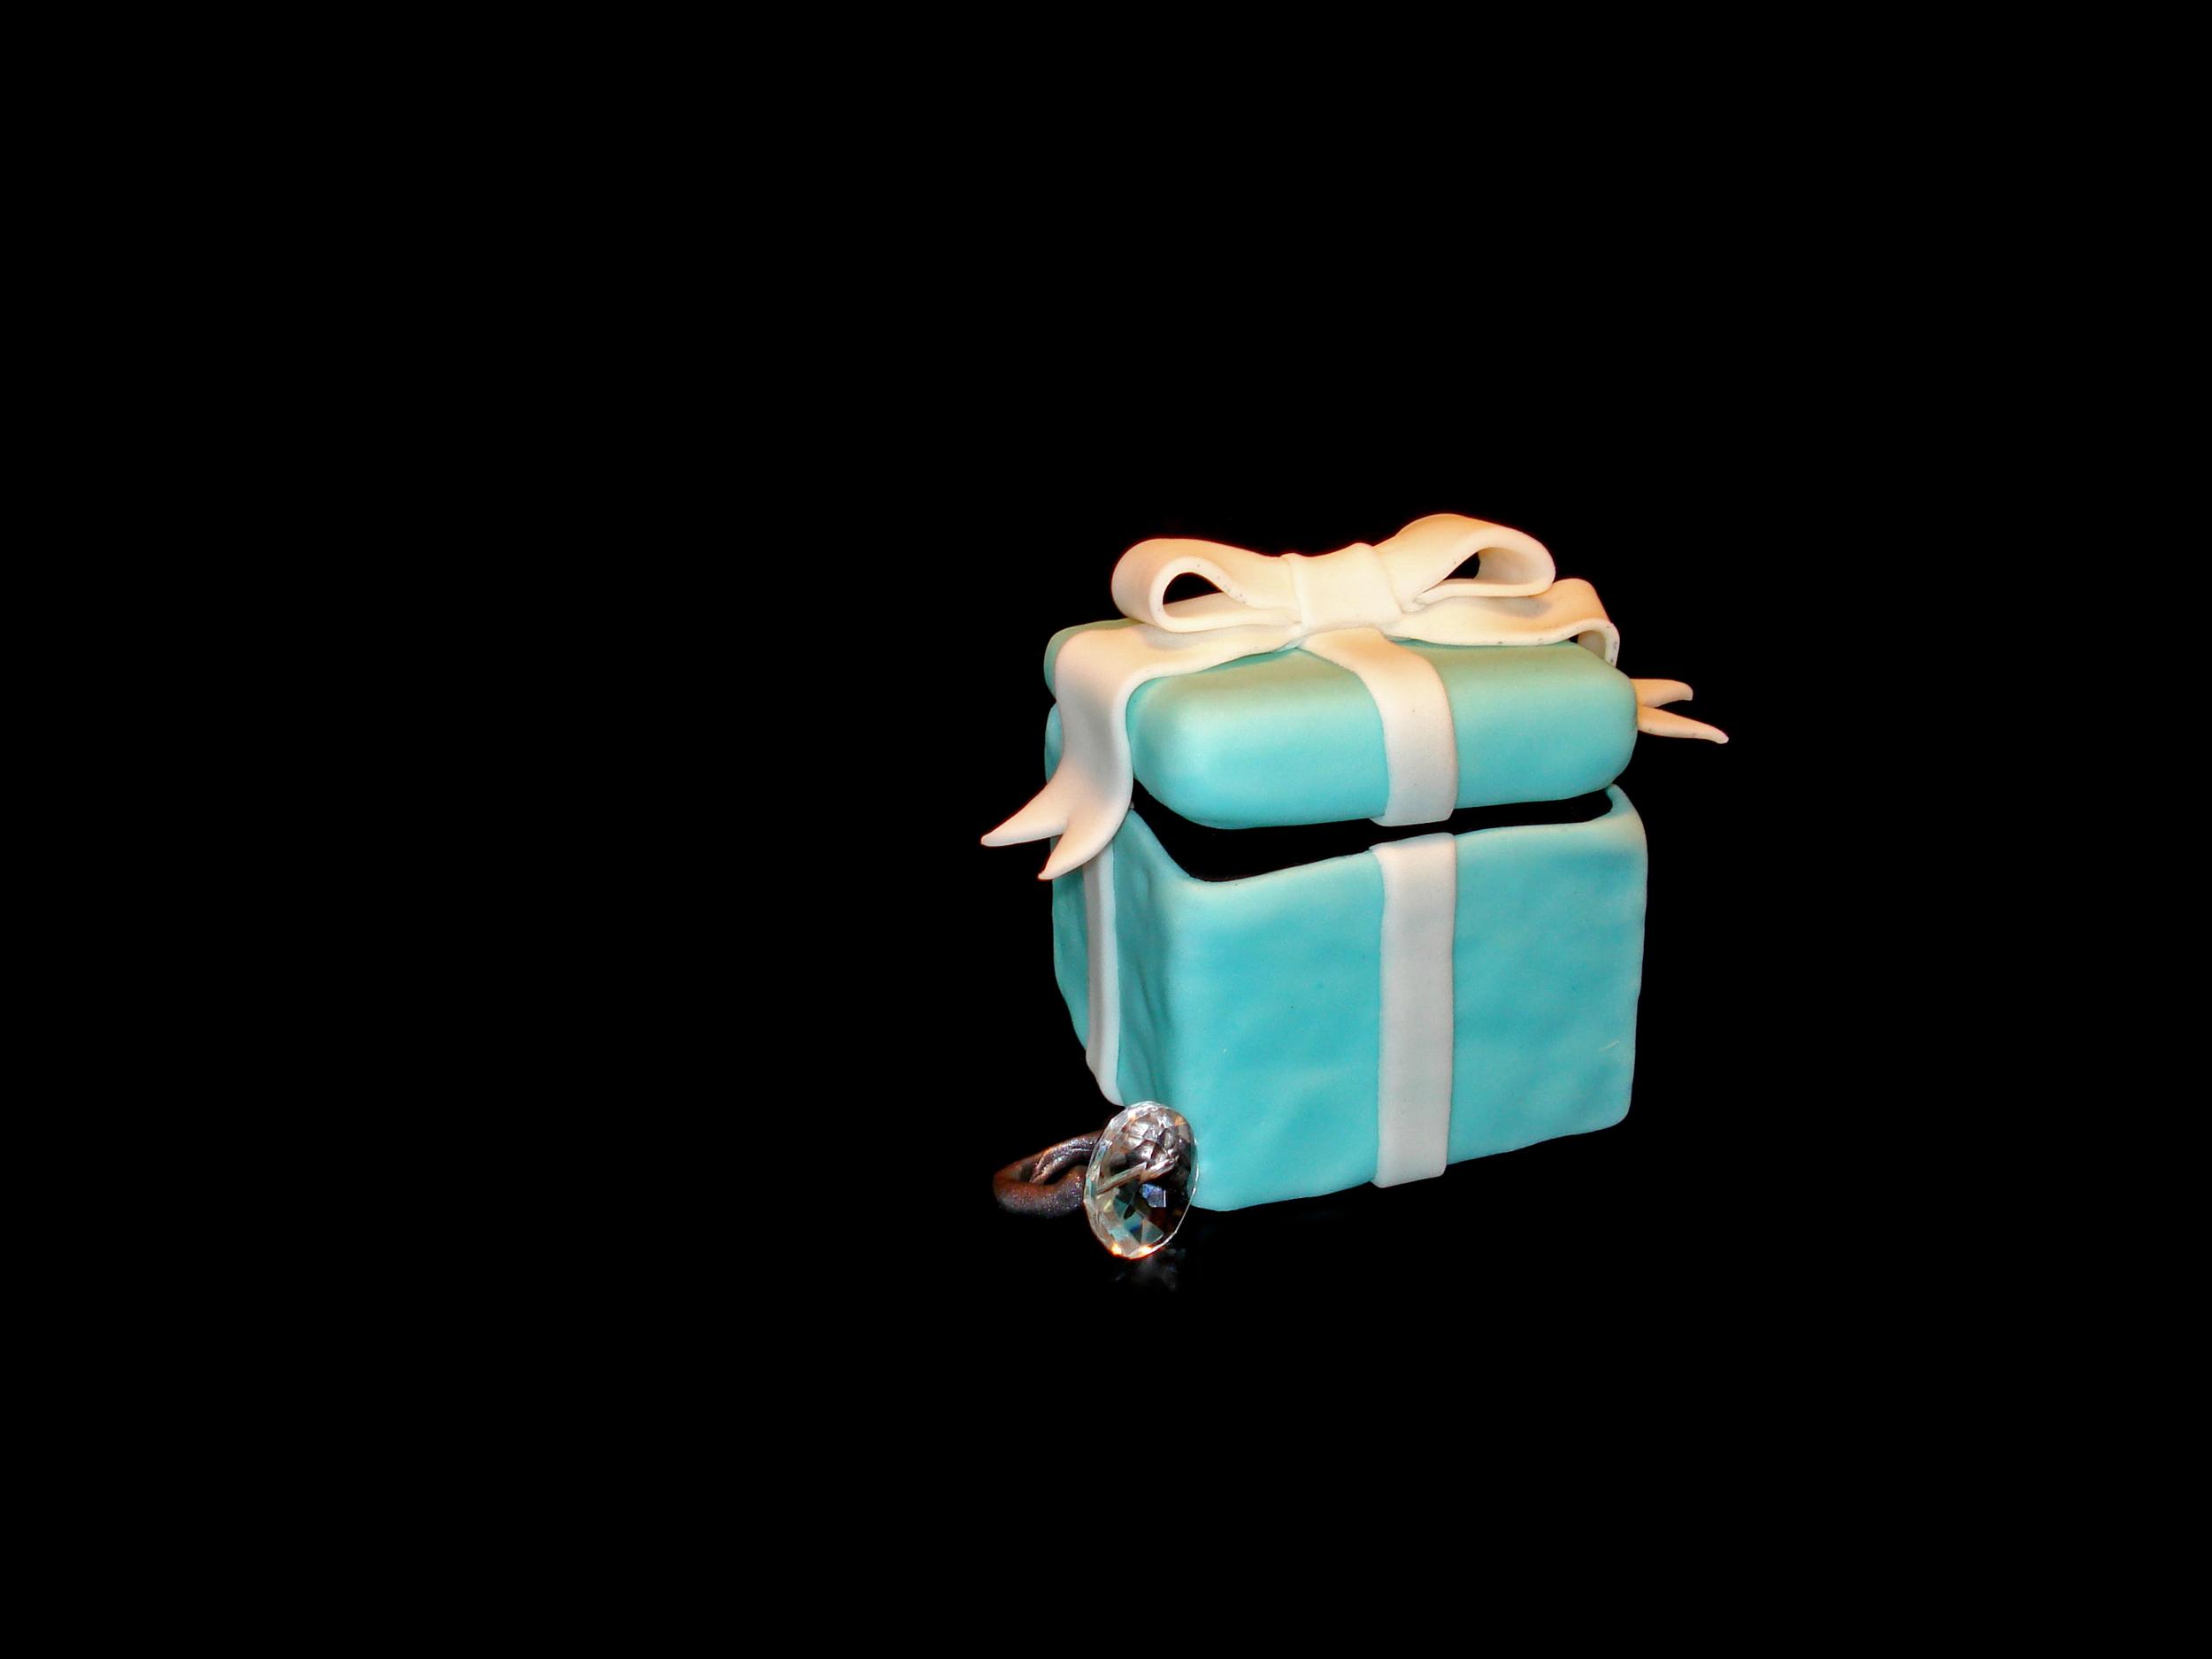 xTiffany's Box.jpg